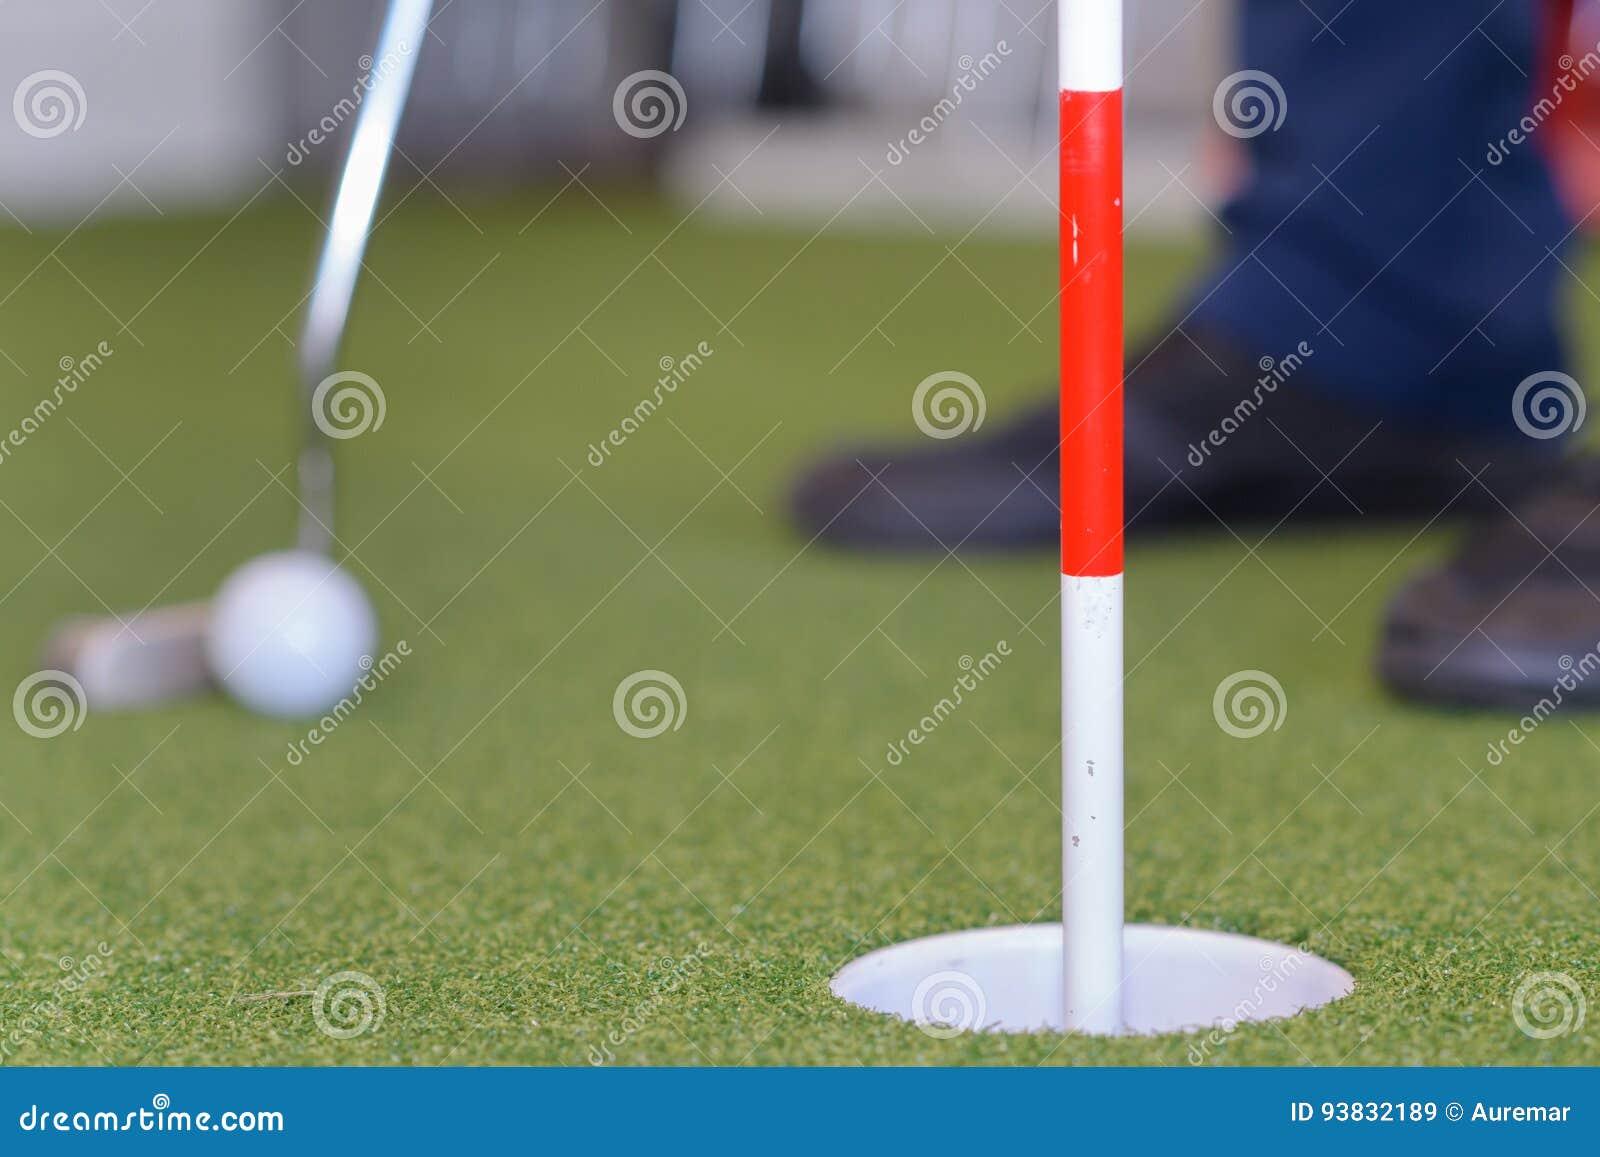 Shot golf ball with golf club